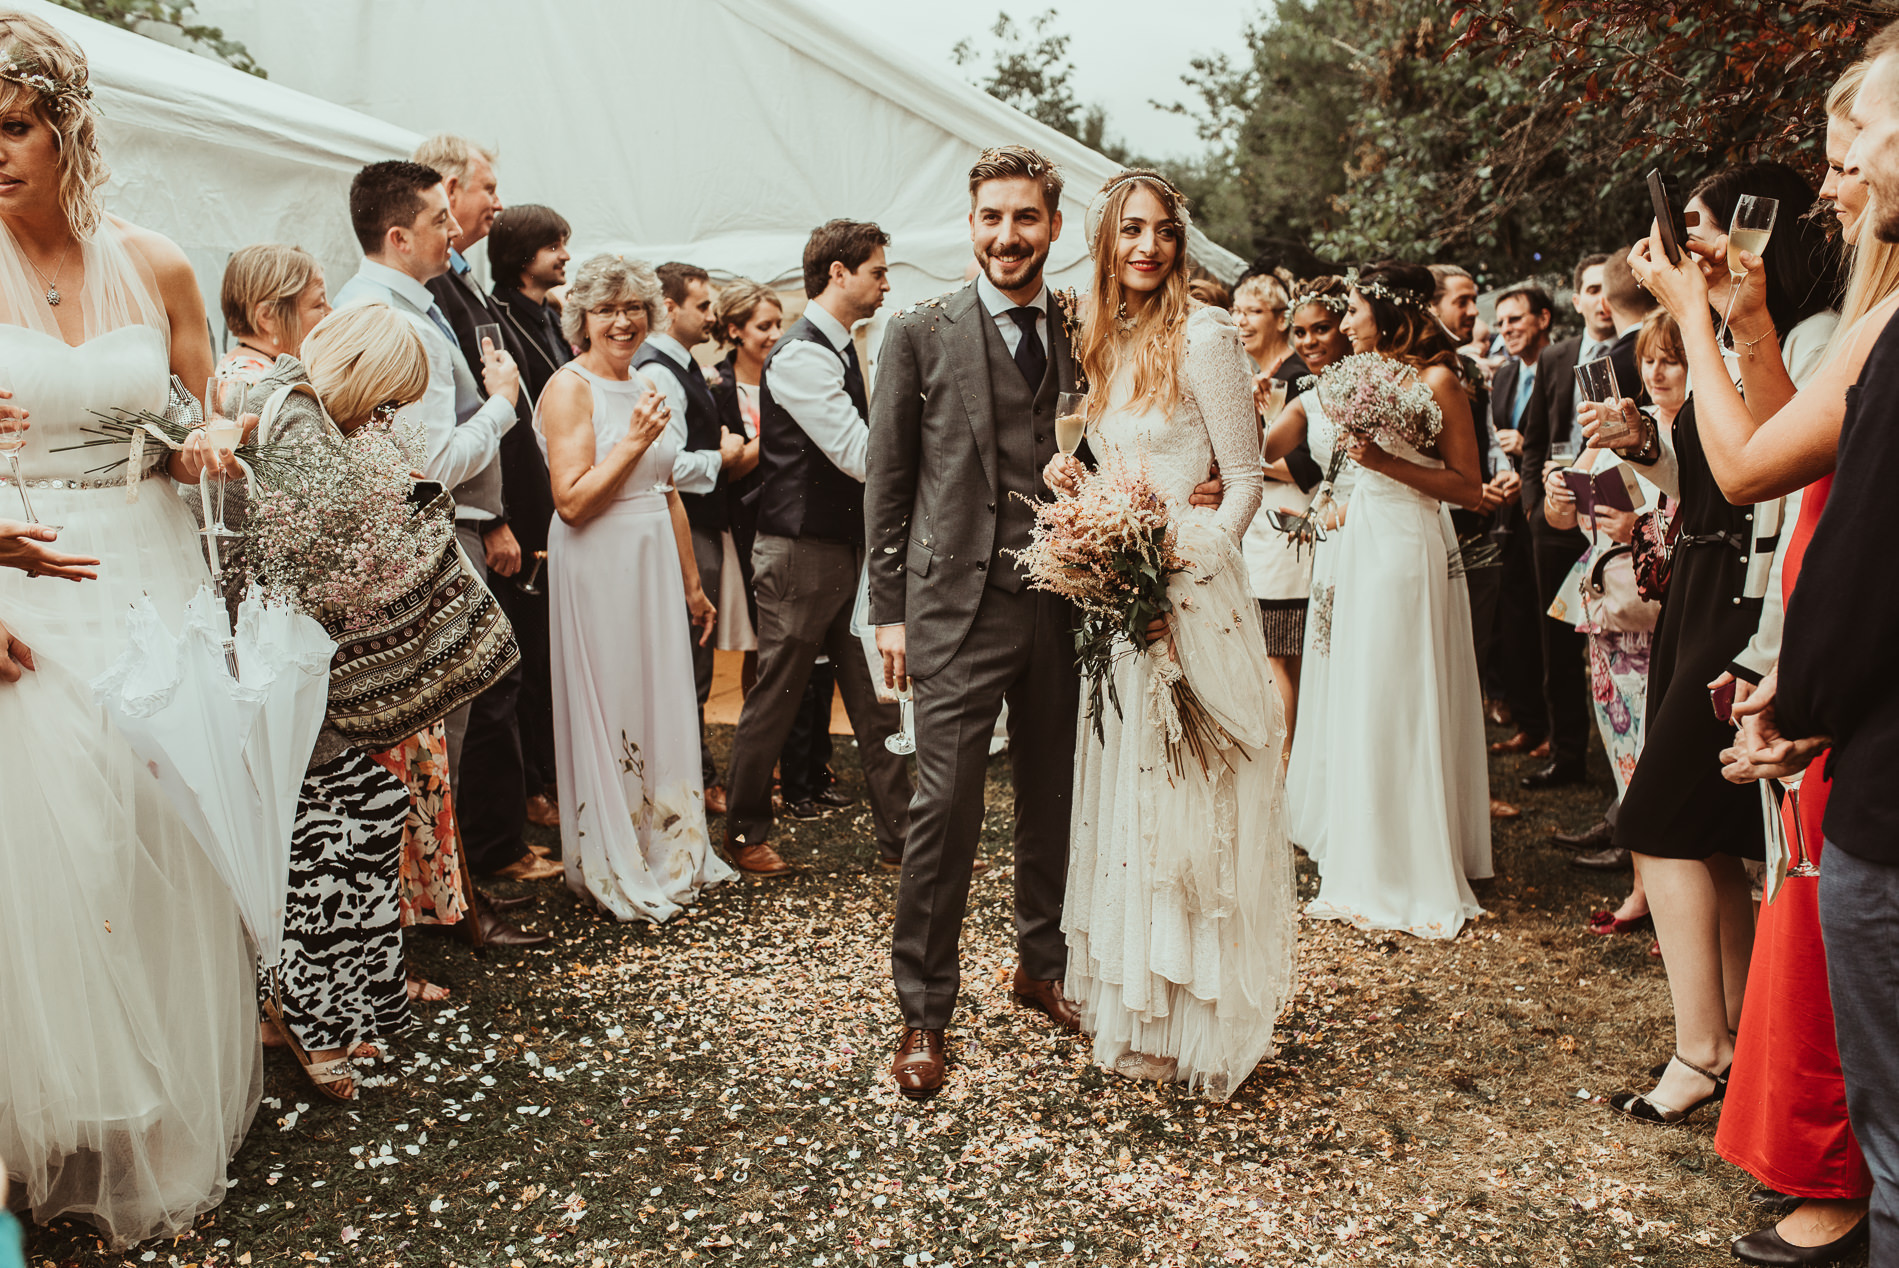 bohemian_wedding_lawshall_church_garden54